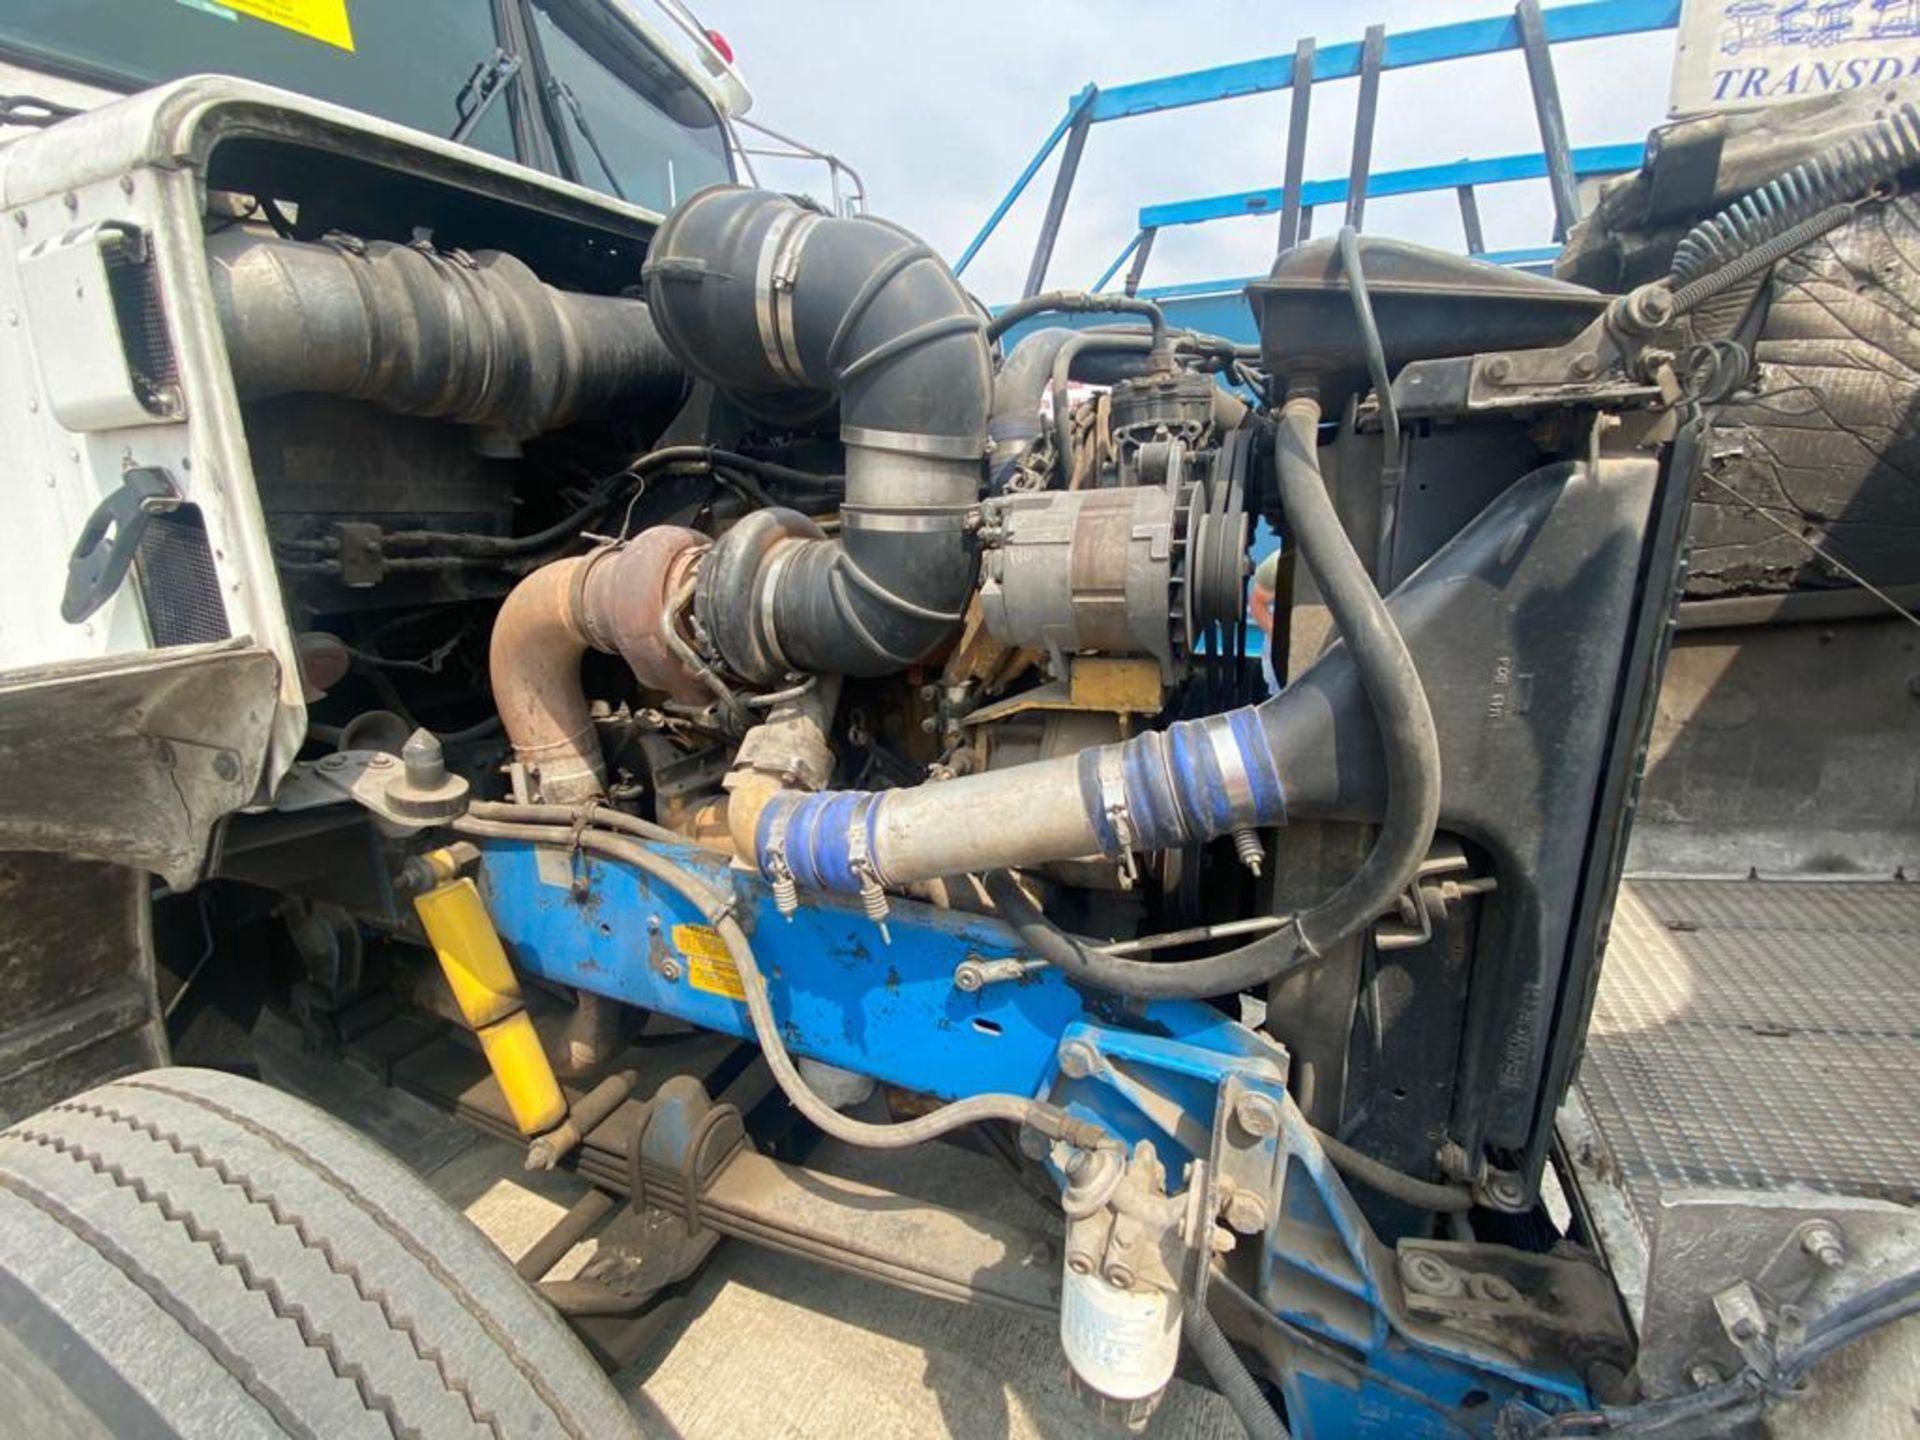 1999 Kenworth Sleeper truck tractor, standard transmission of 18 speeds - Image 50 of 62